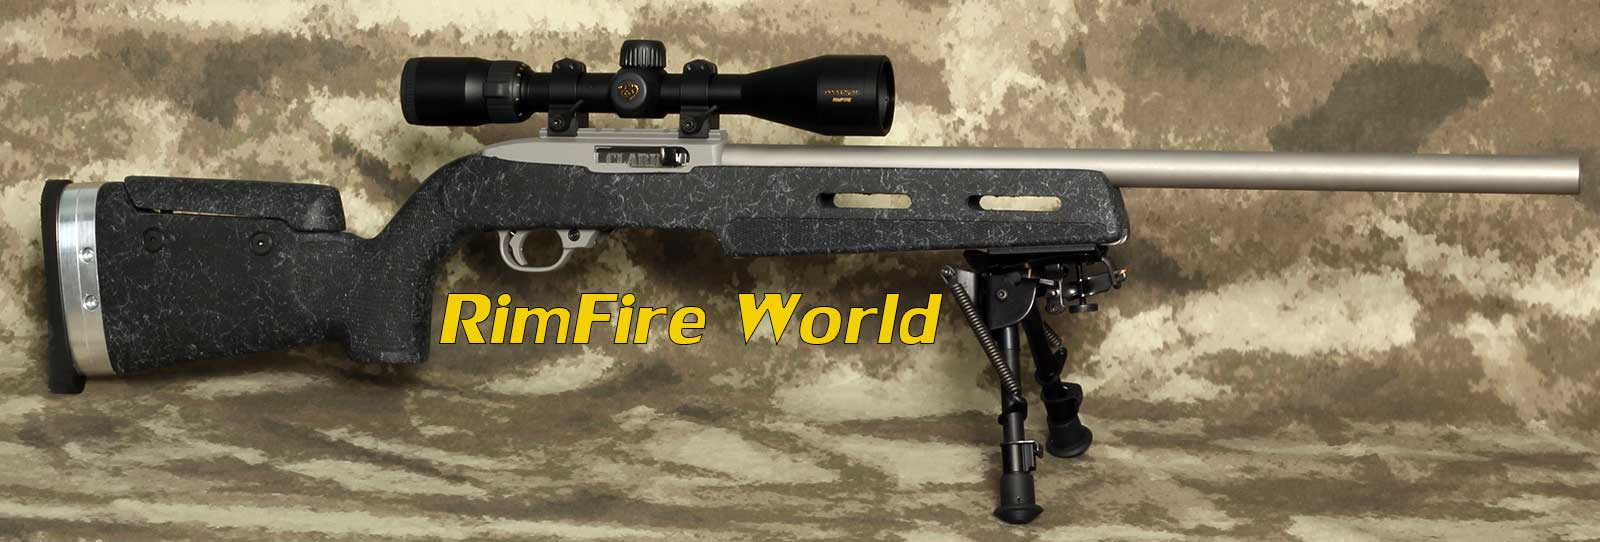 Clark Custom Ruger 10 22 Rimfire World